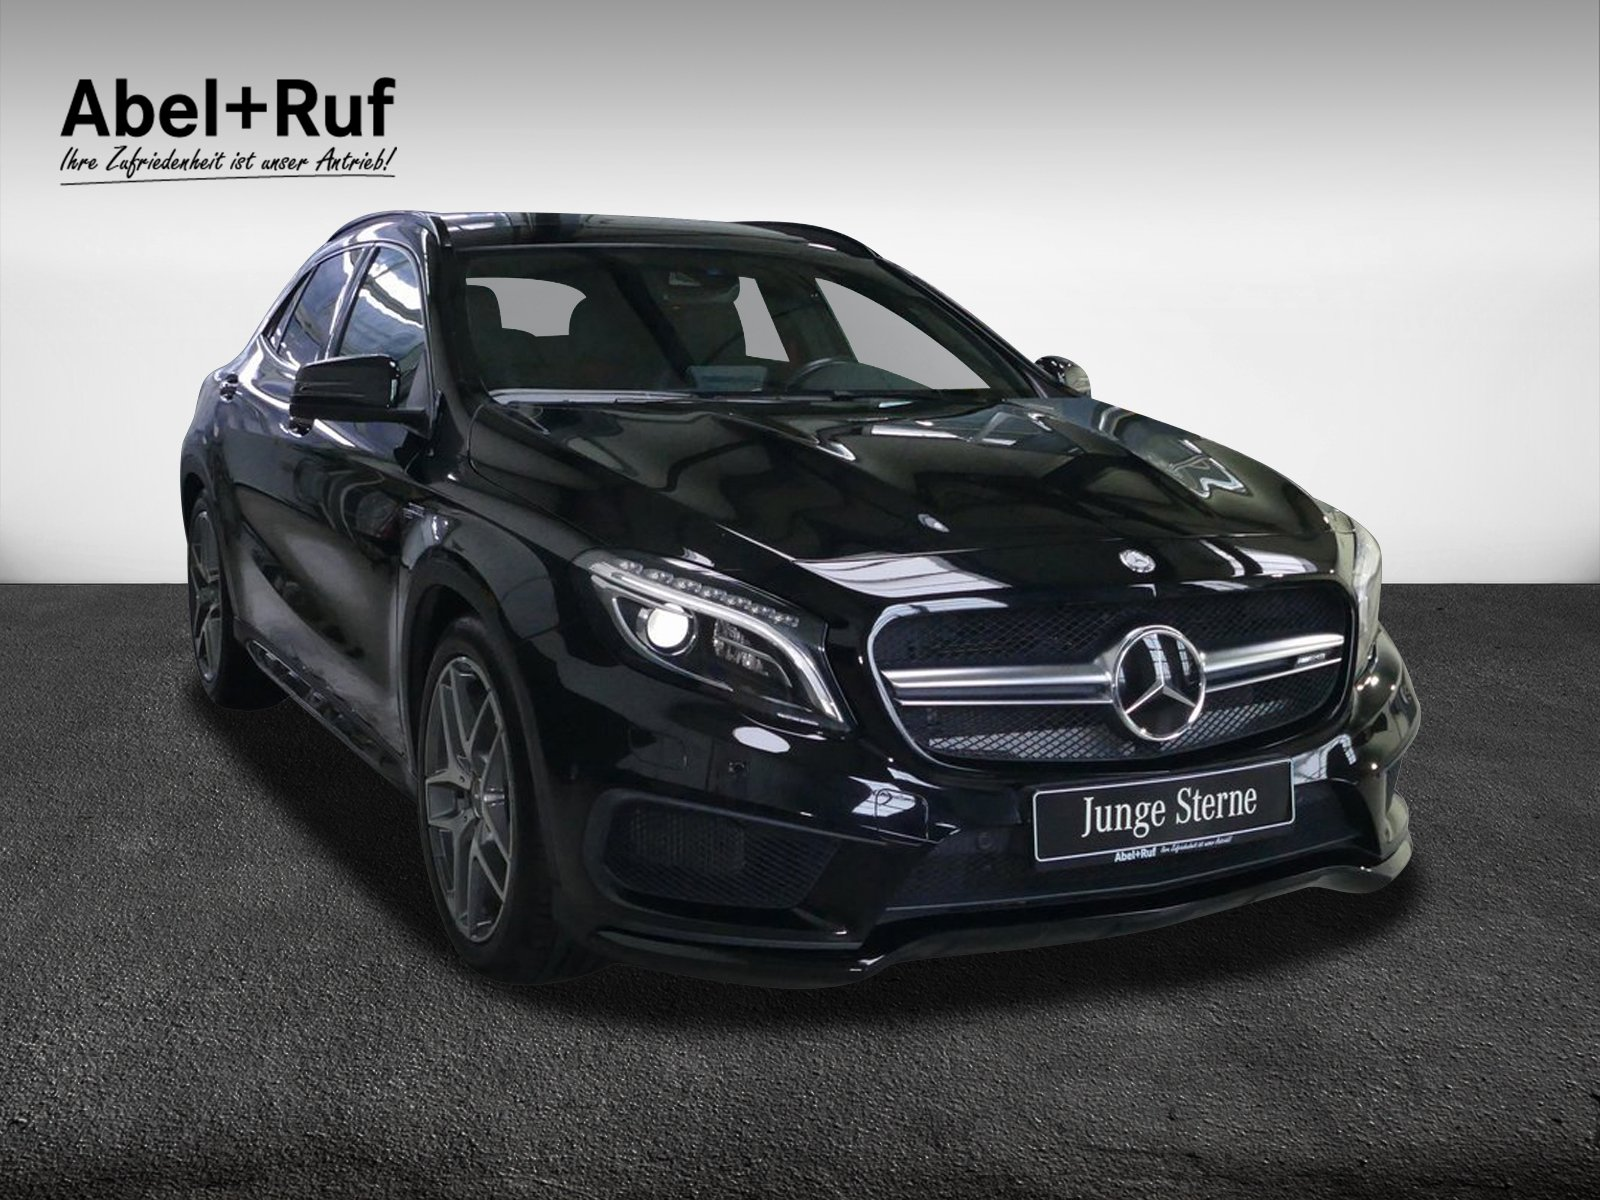 Mercedes-Benz GLA 45 AMG 4M Distr.+Spur+Comand+Rück.Kamera+ILS, Jahr 2016, Benzin